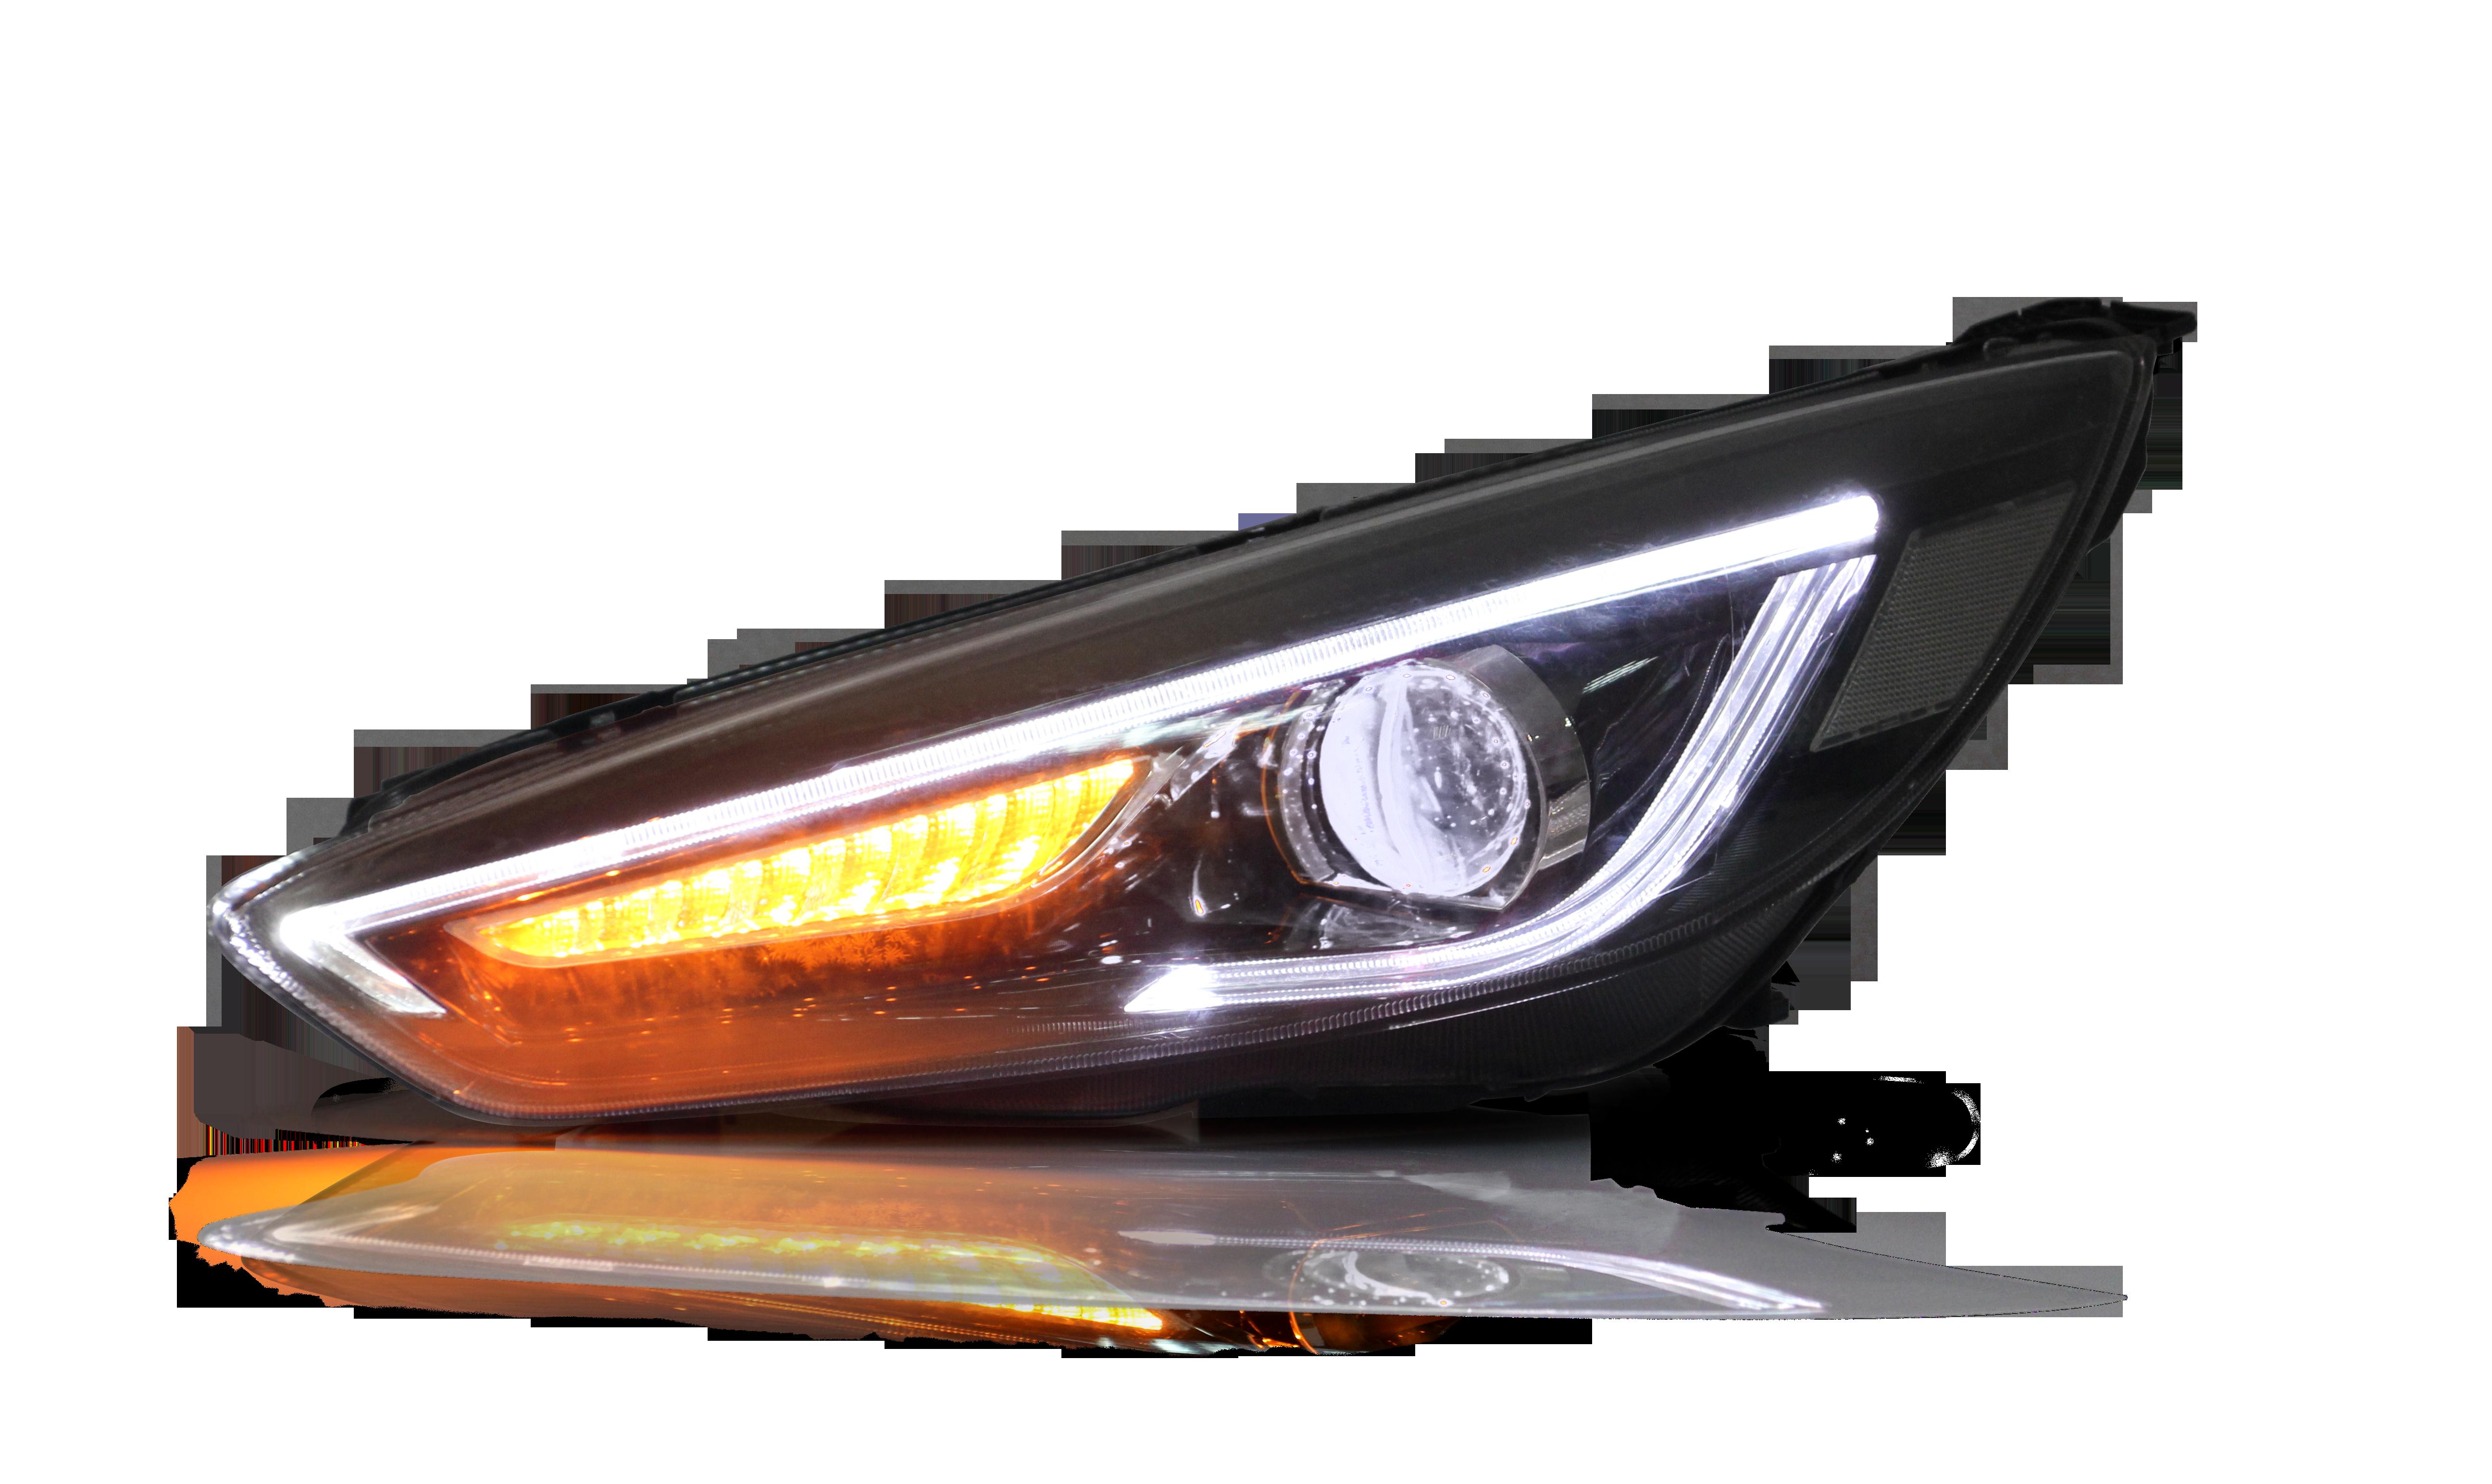 Vland Wholesale New Style Led Head Lamp For Focus 2015 2016 2017 Head Light This Item Is Vland Ledheadlight Master Gra Car Accessories Headlamp Led Headlights